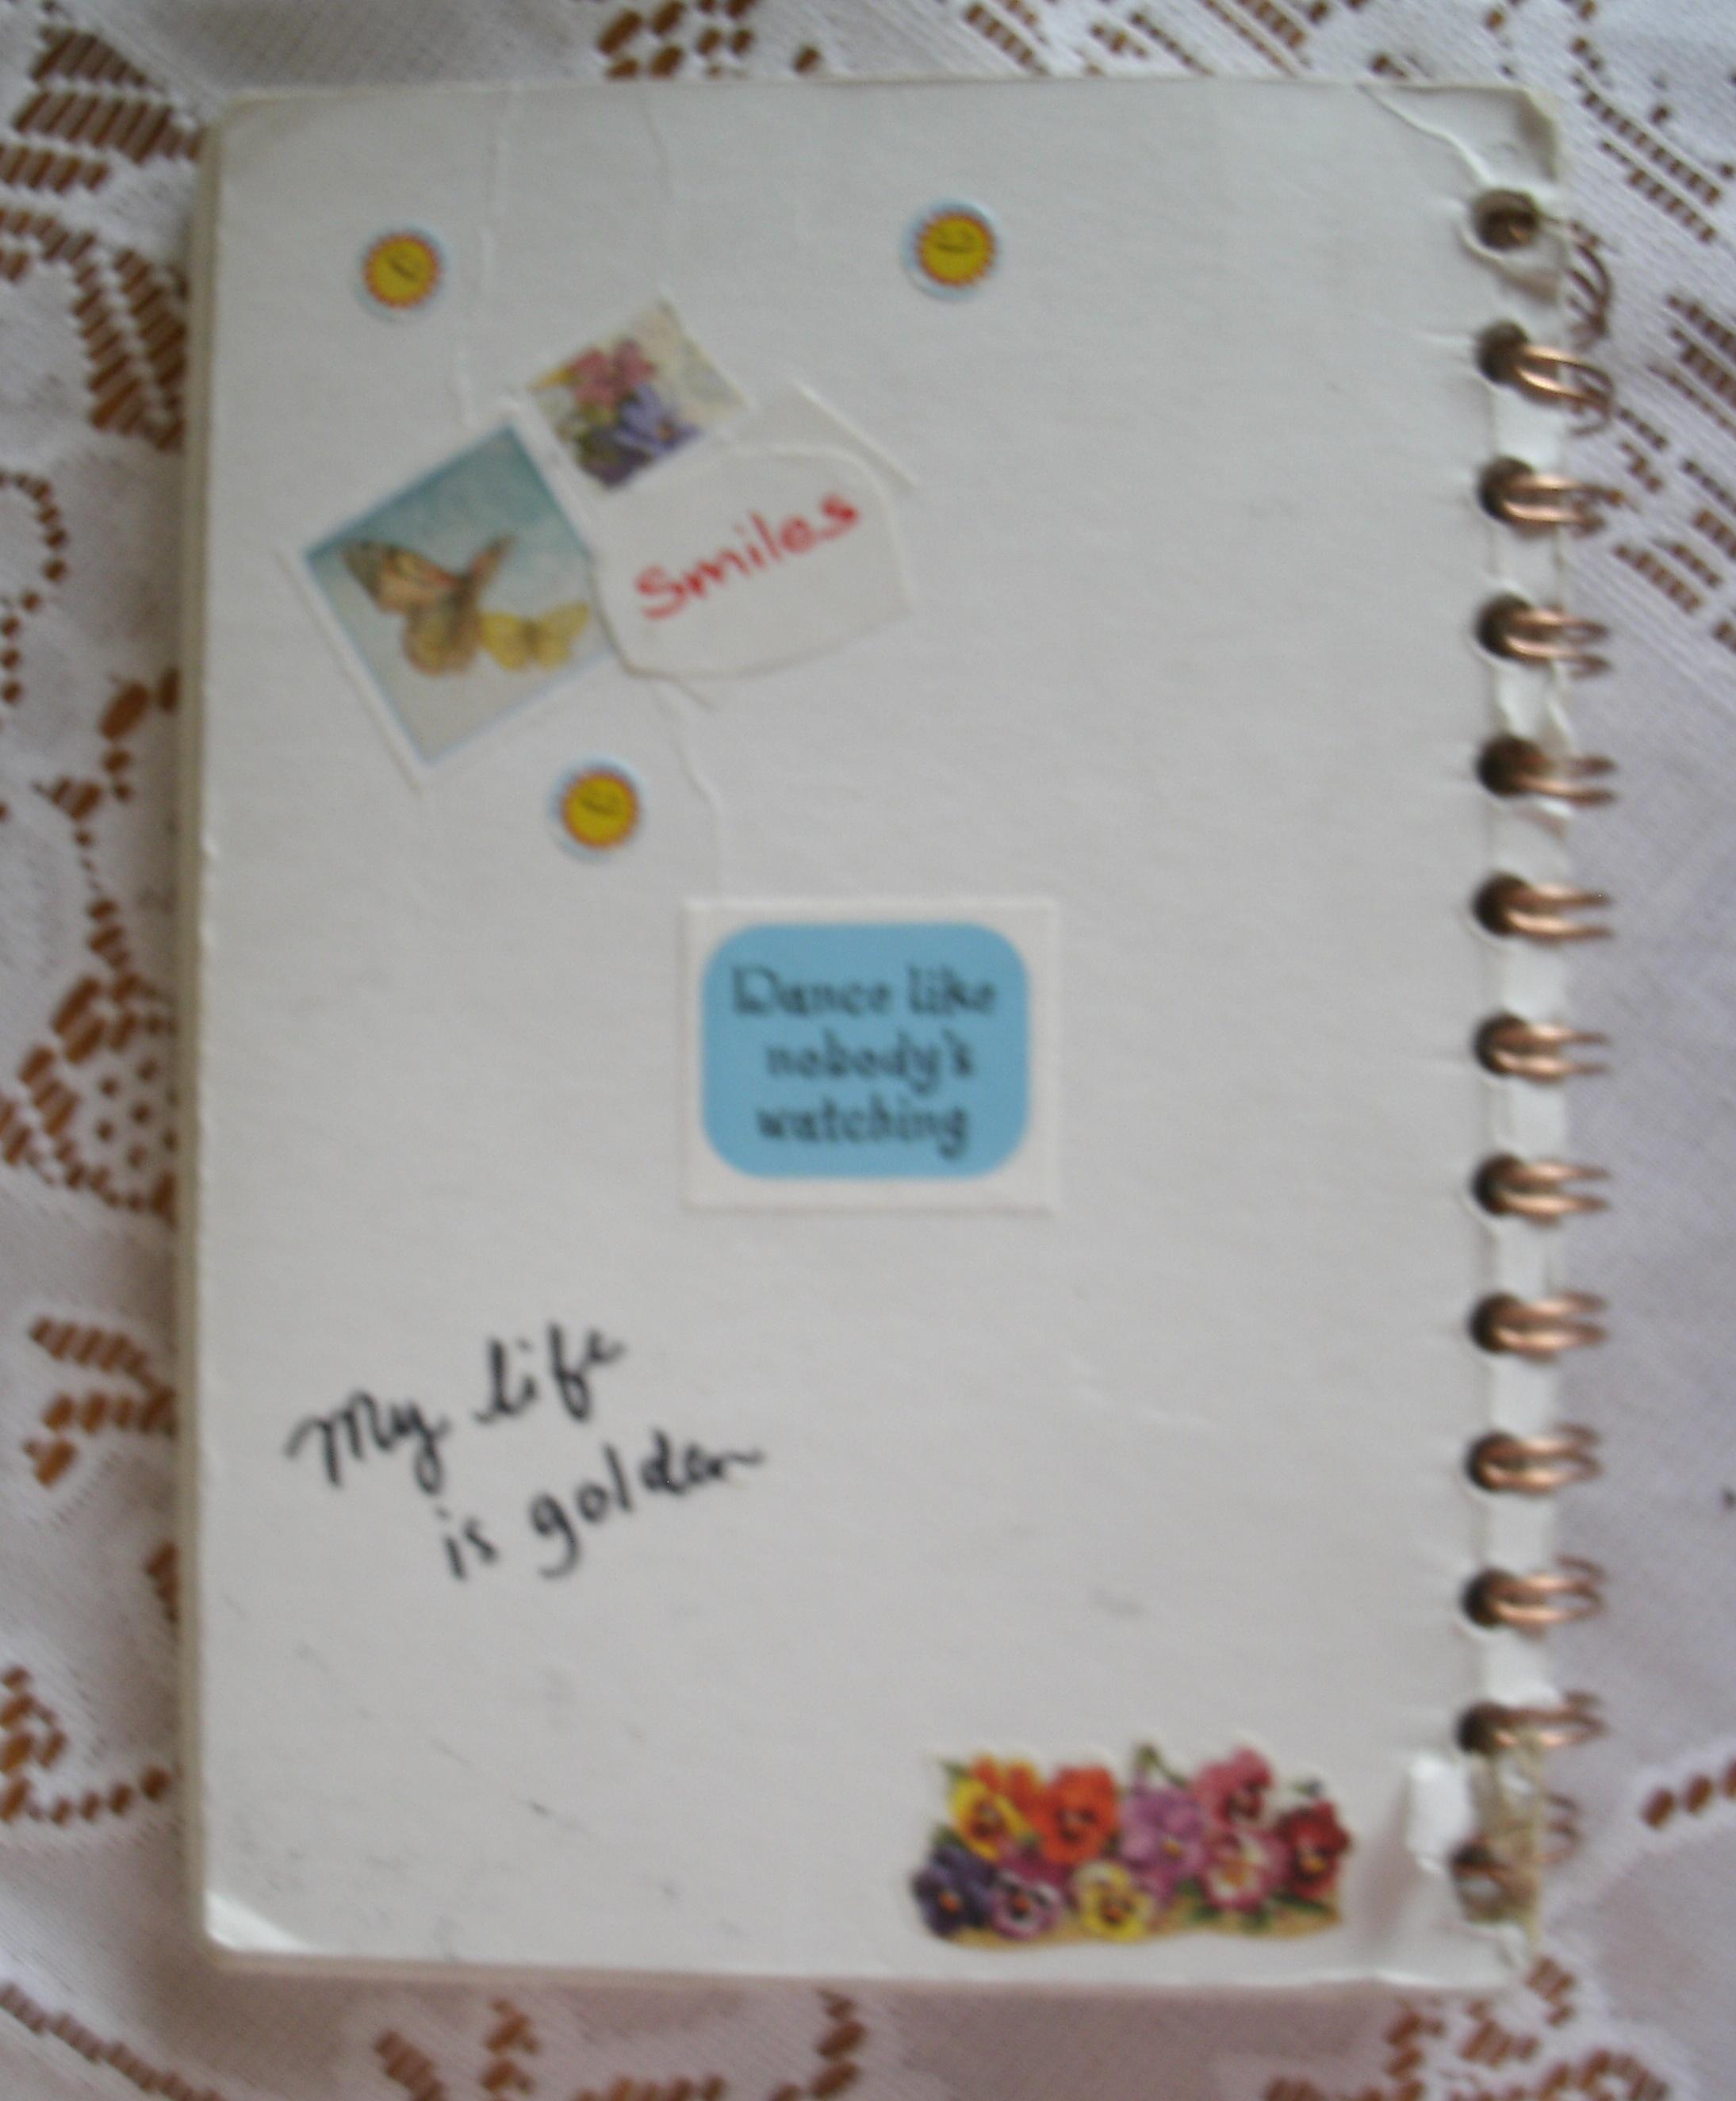 Back Side of Gratitude Journal